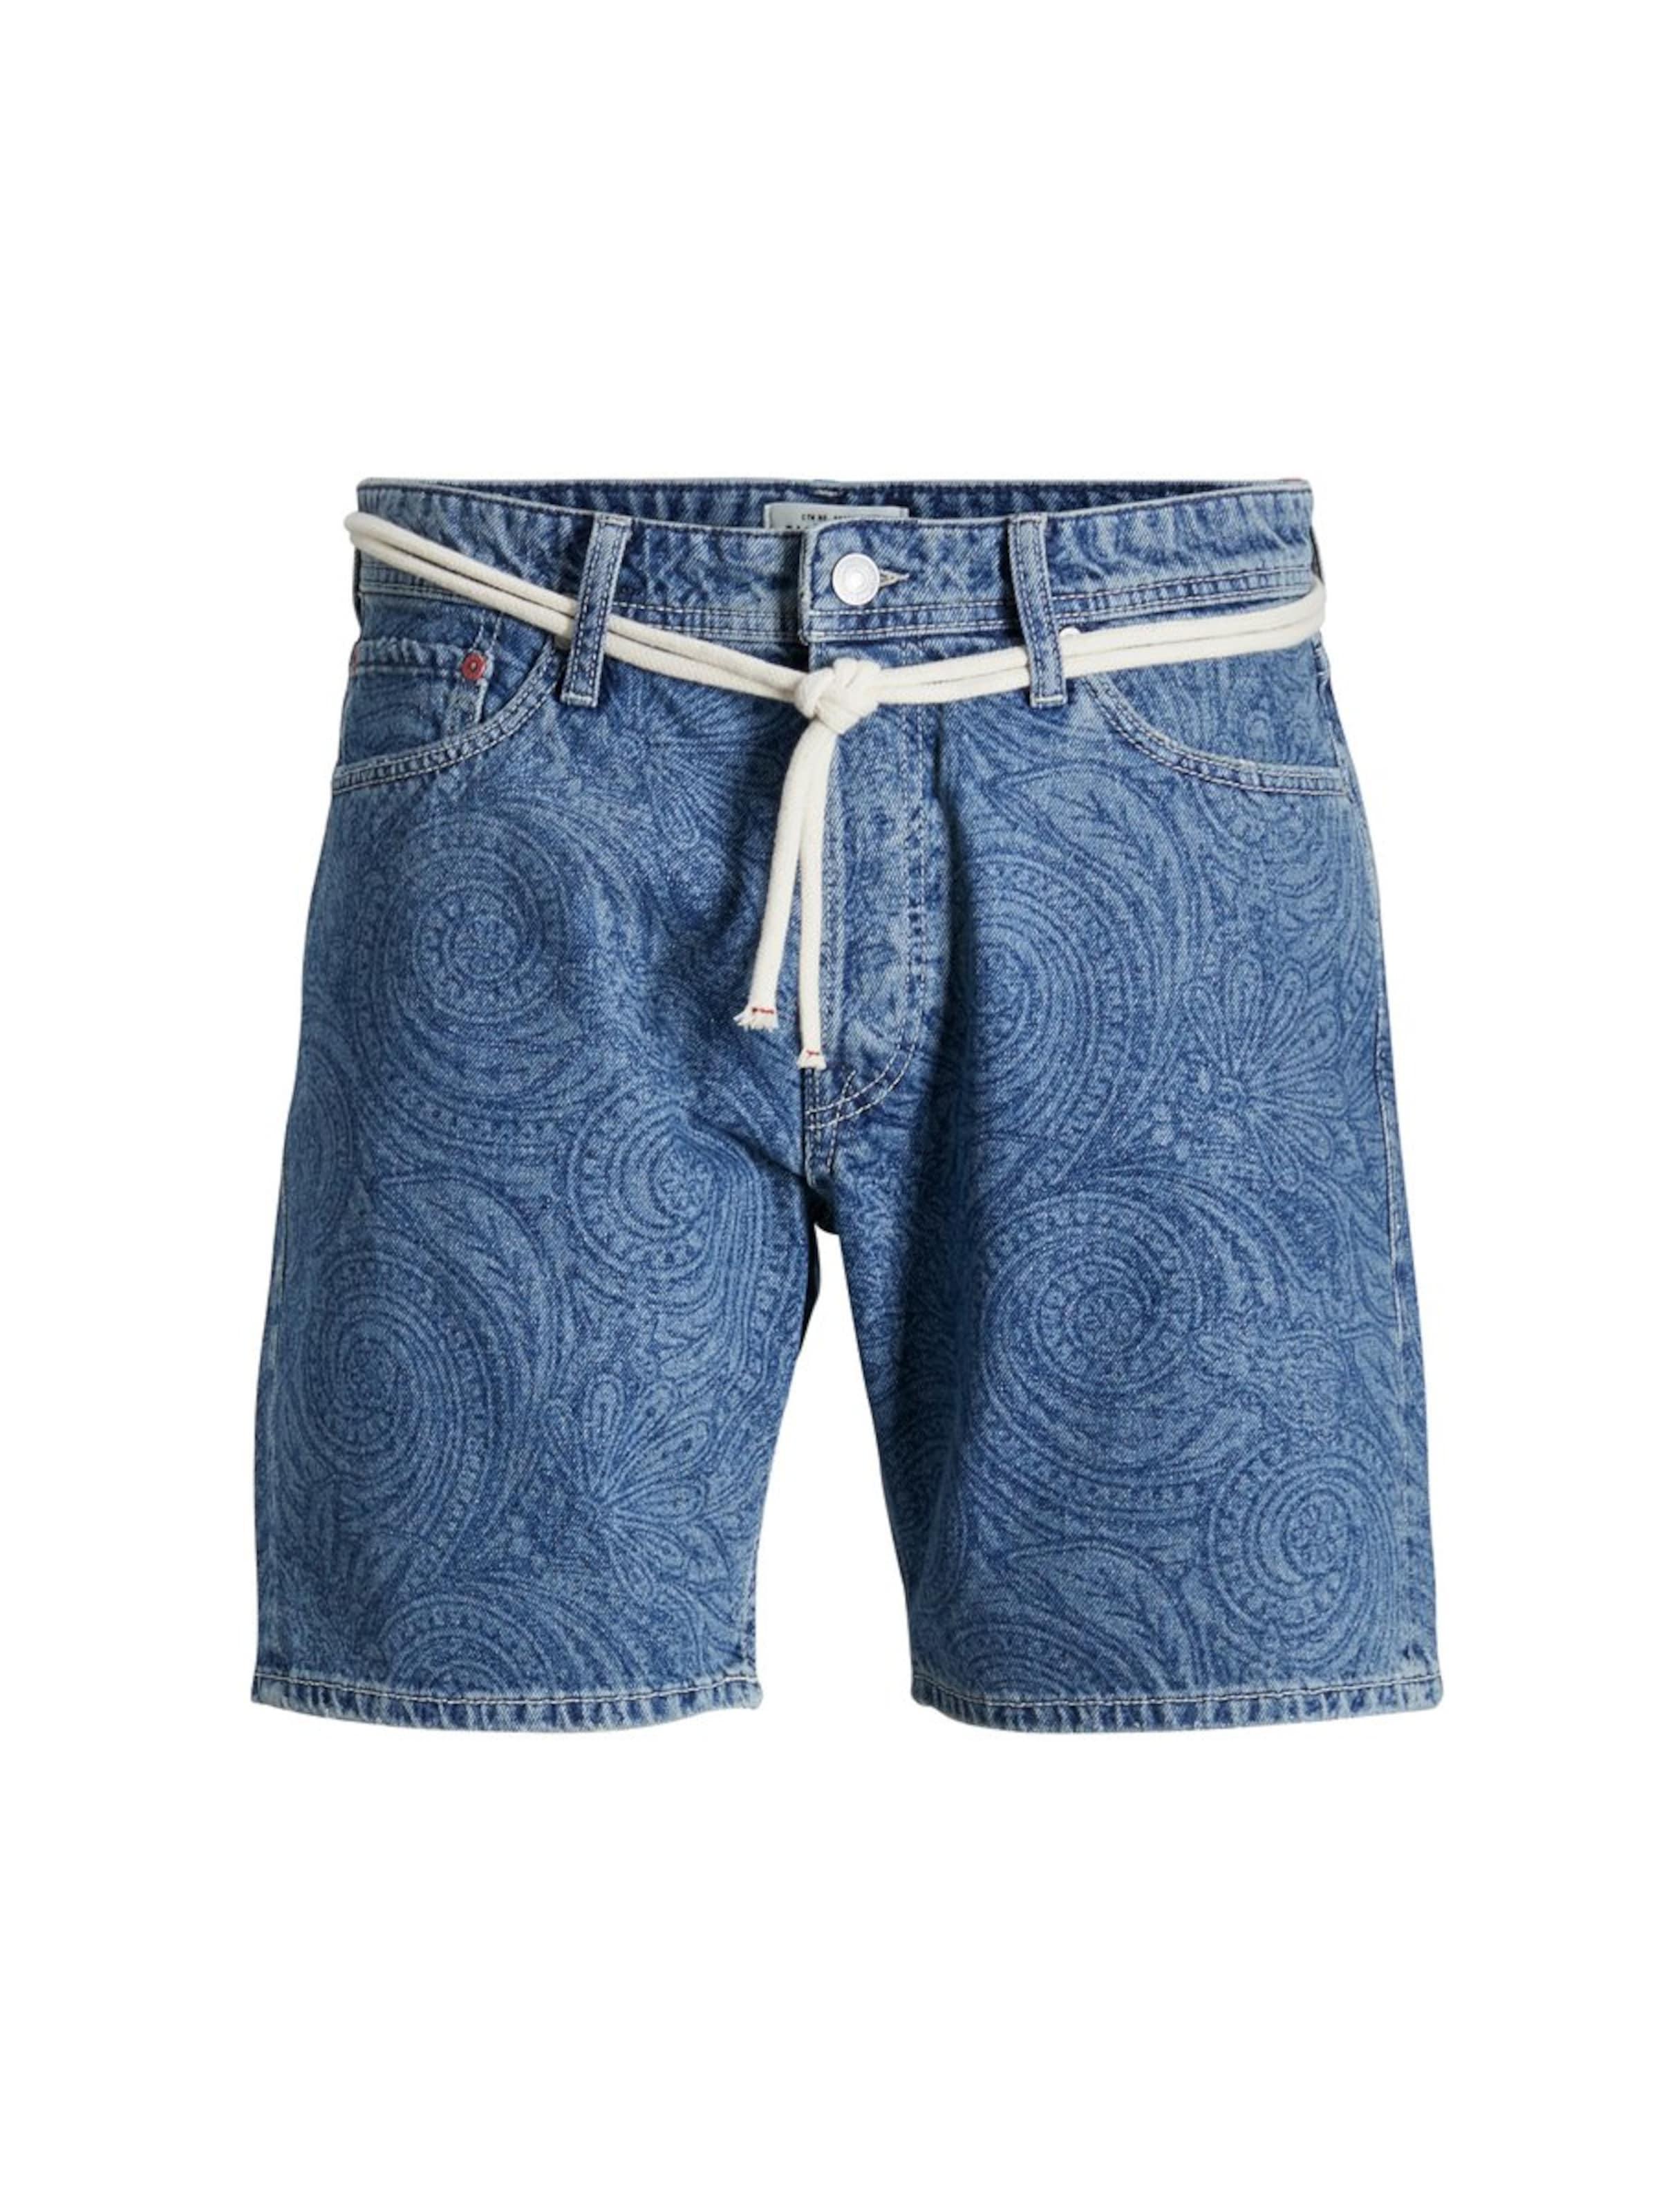 Shorts In Jackamp; Blue Jones Denim 'chris' eEbDYW29HI